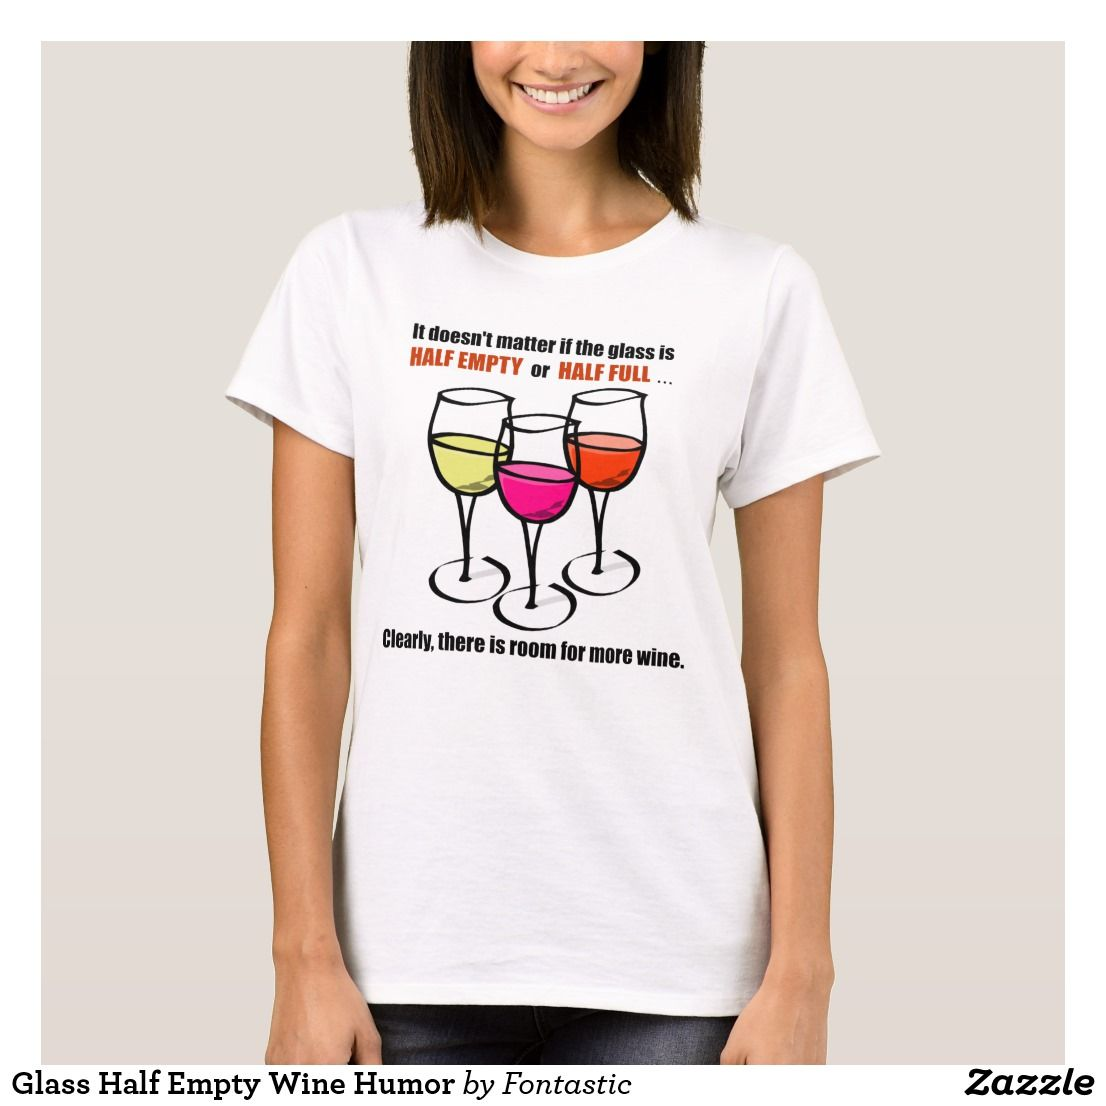 Glass Half Empty Wine Humor T Shirt